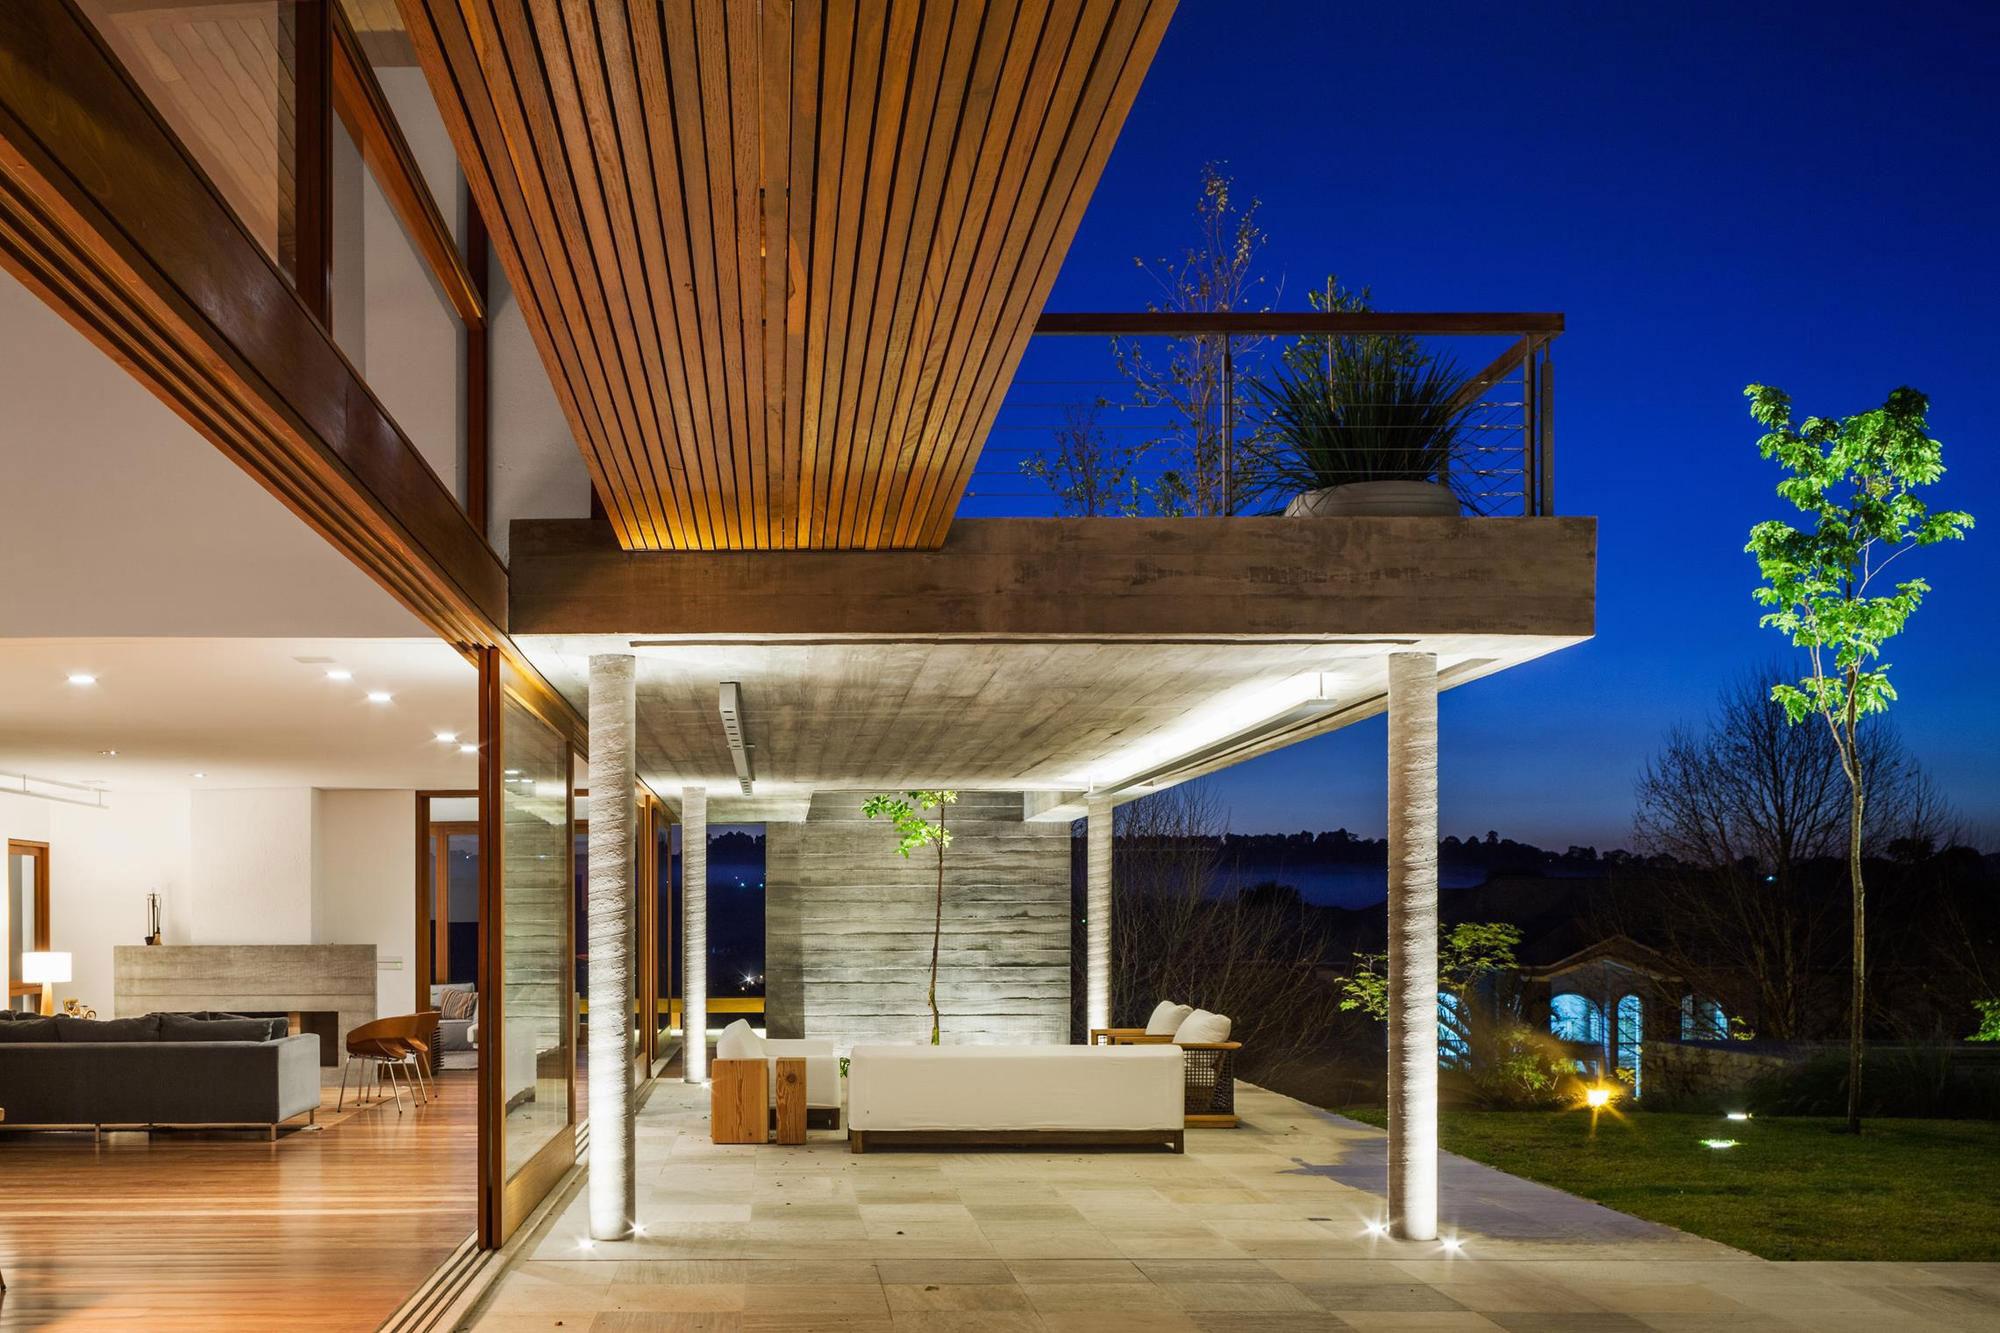 FT Modern Holiday and Weekend House by Reinach Mendonça Arquitetos Associados-15